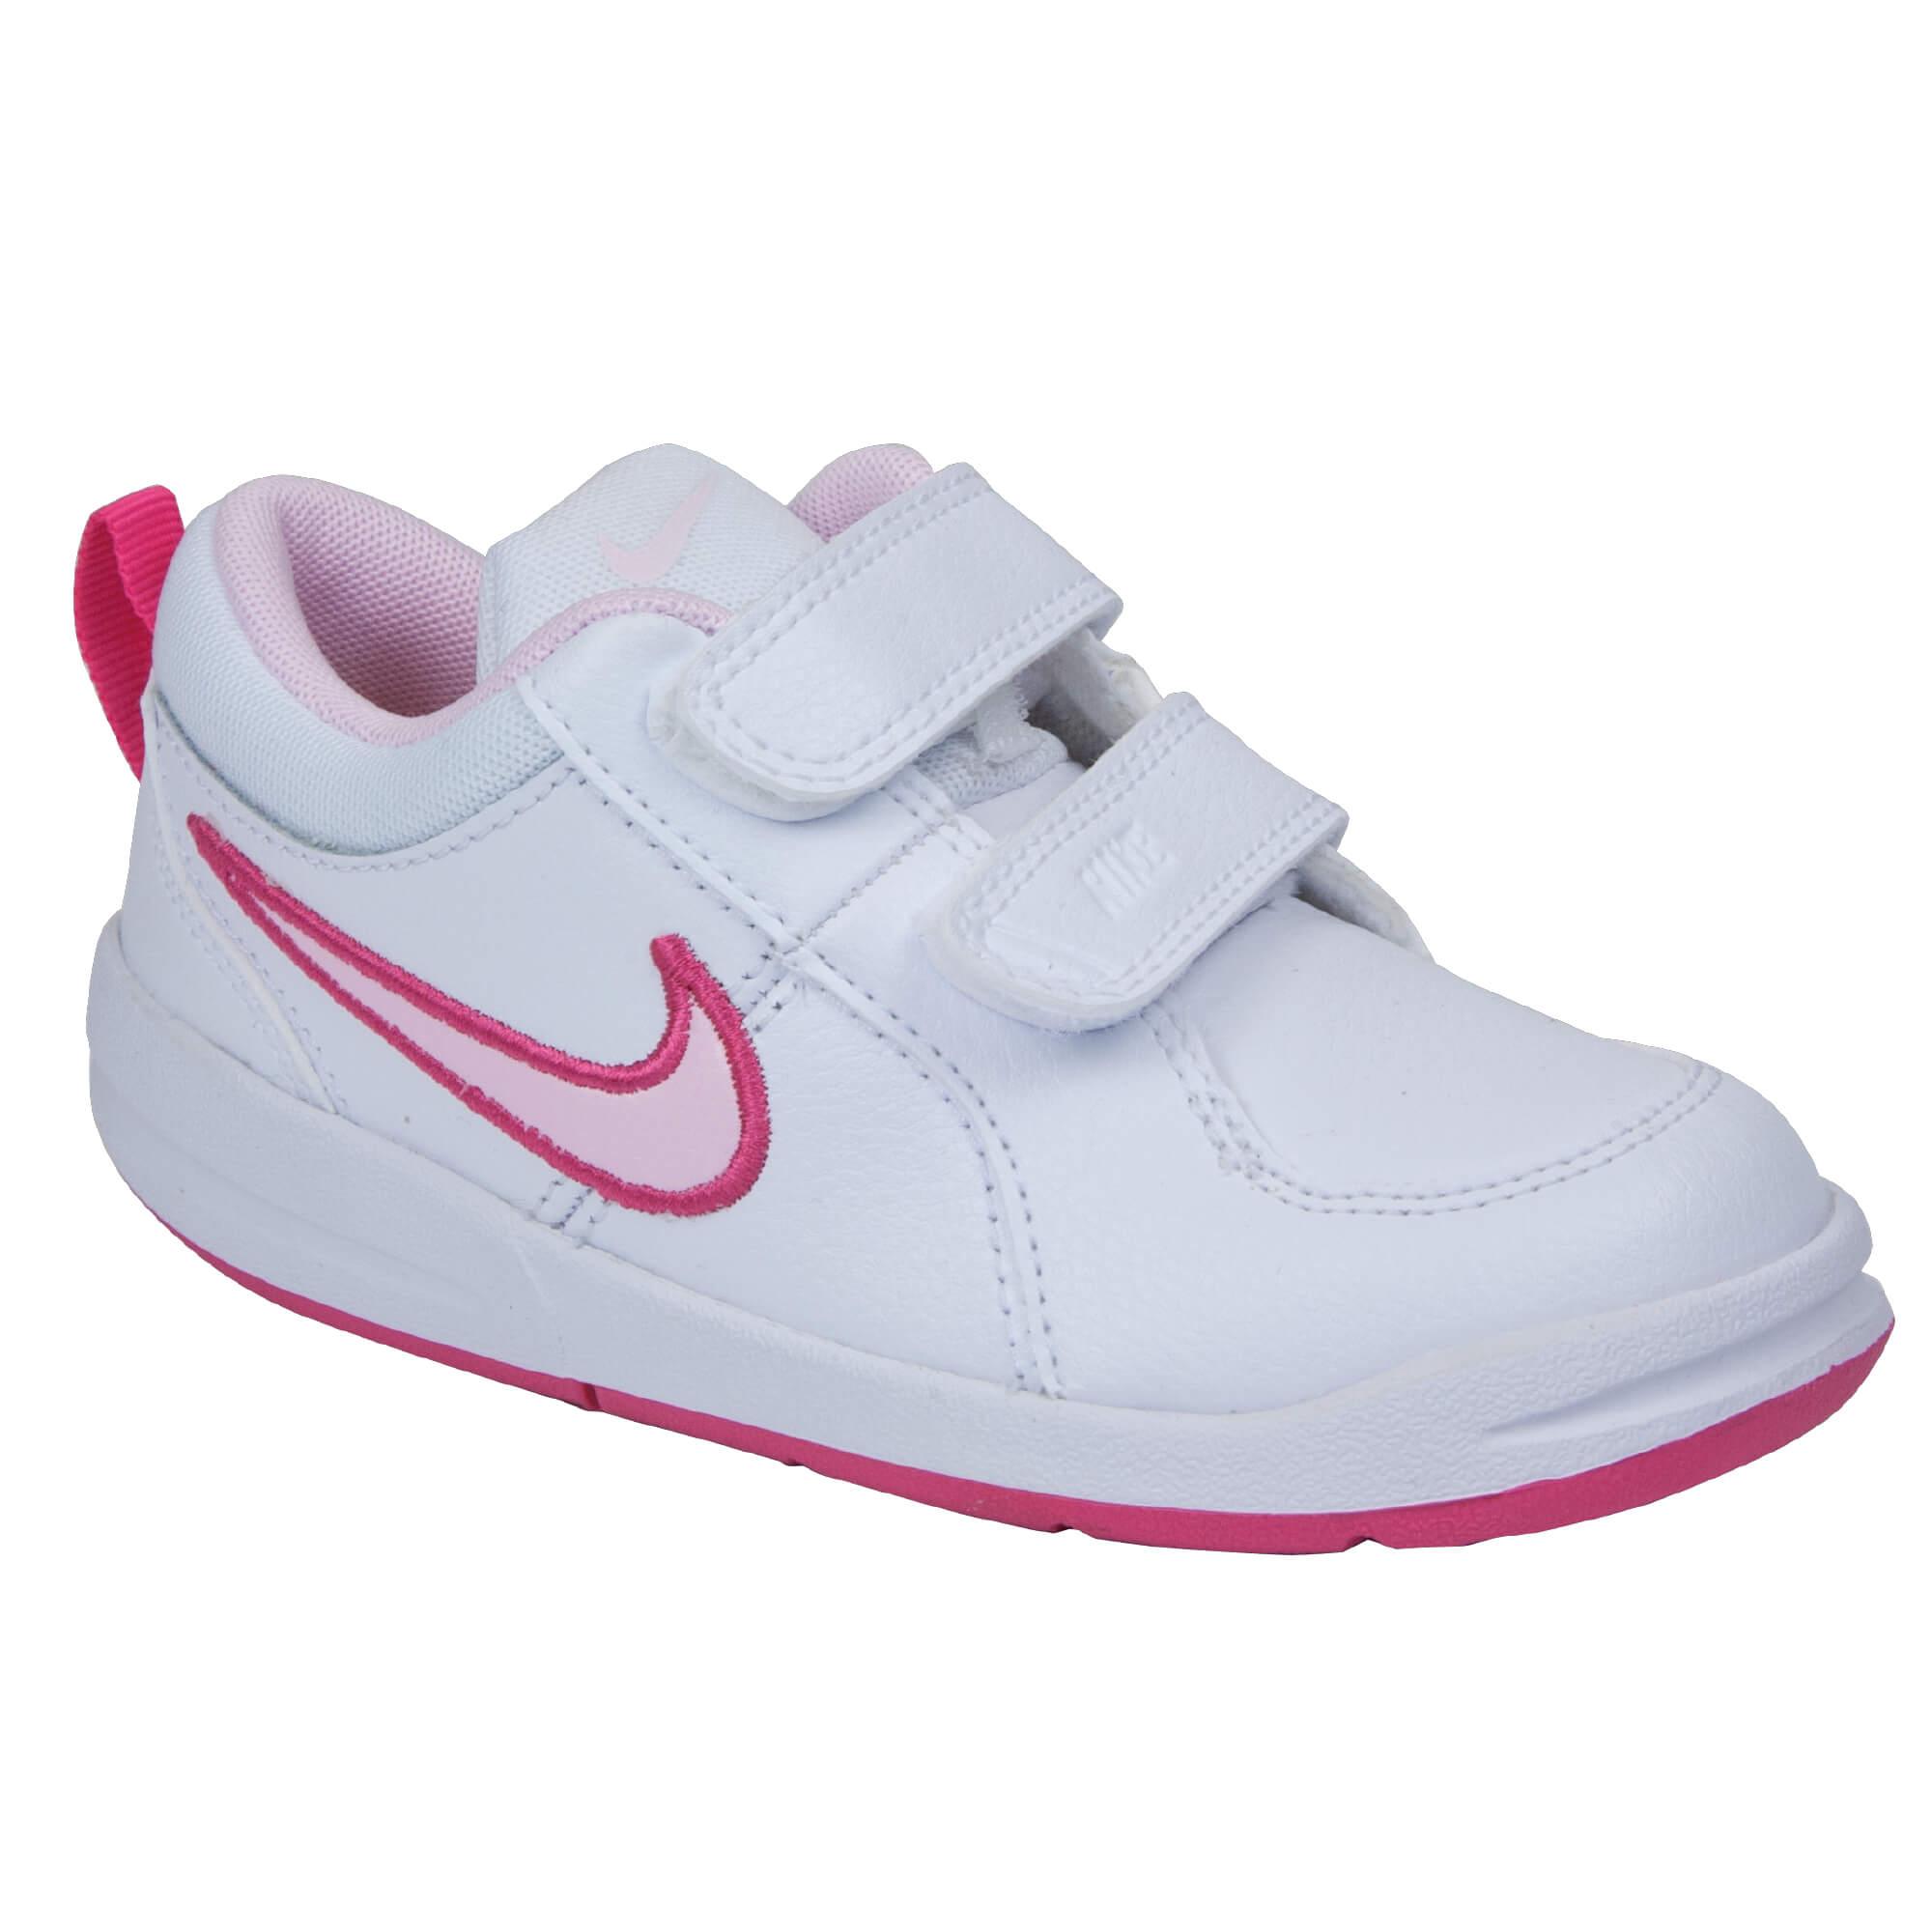 Pico 4 Nike poza